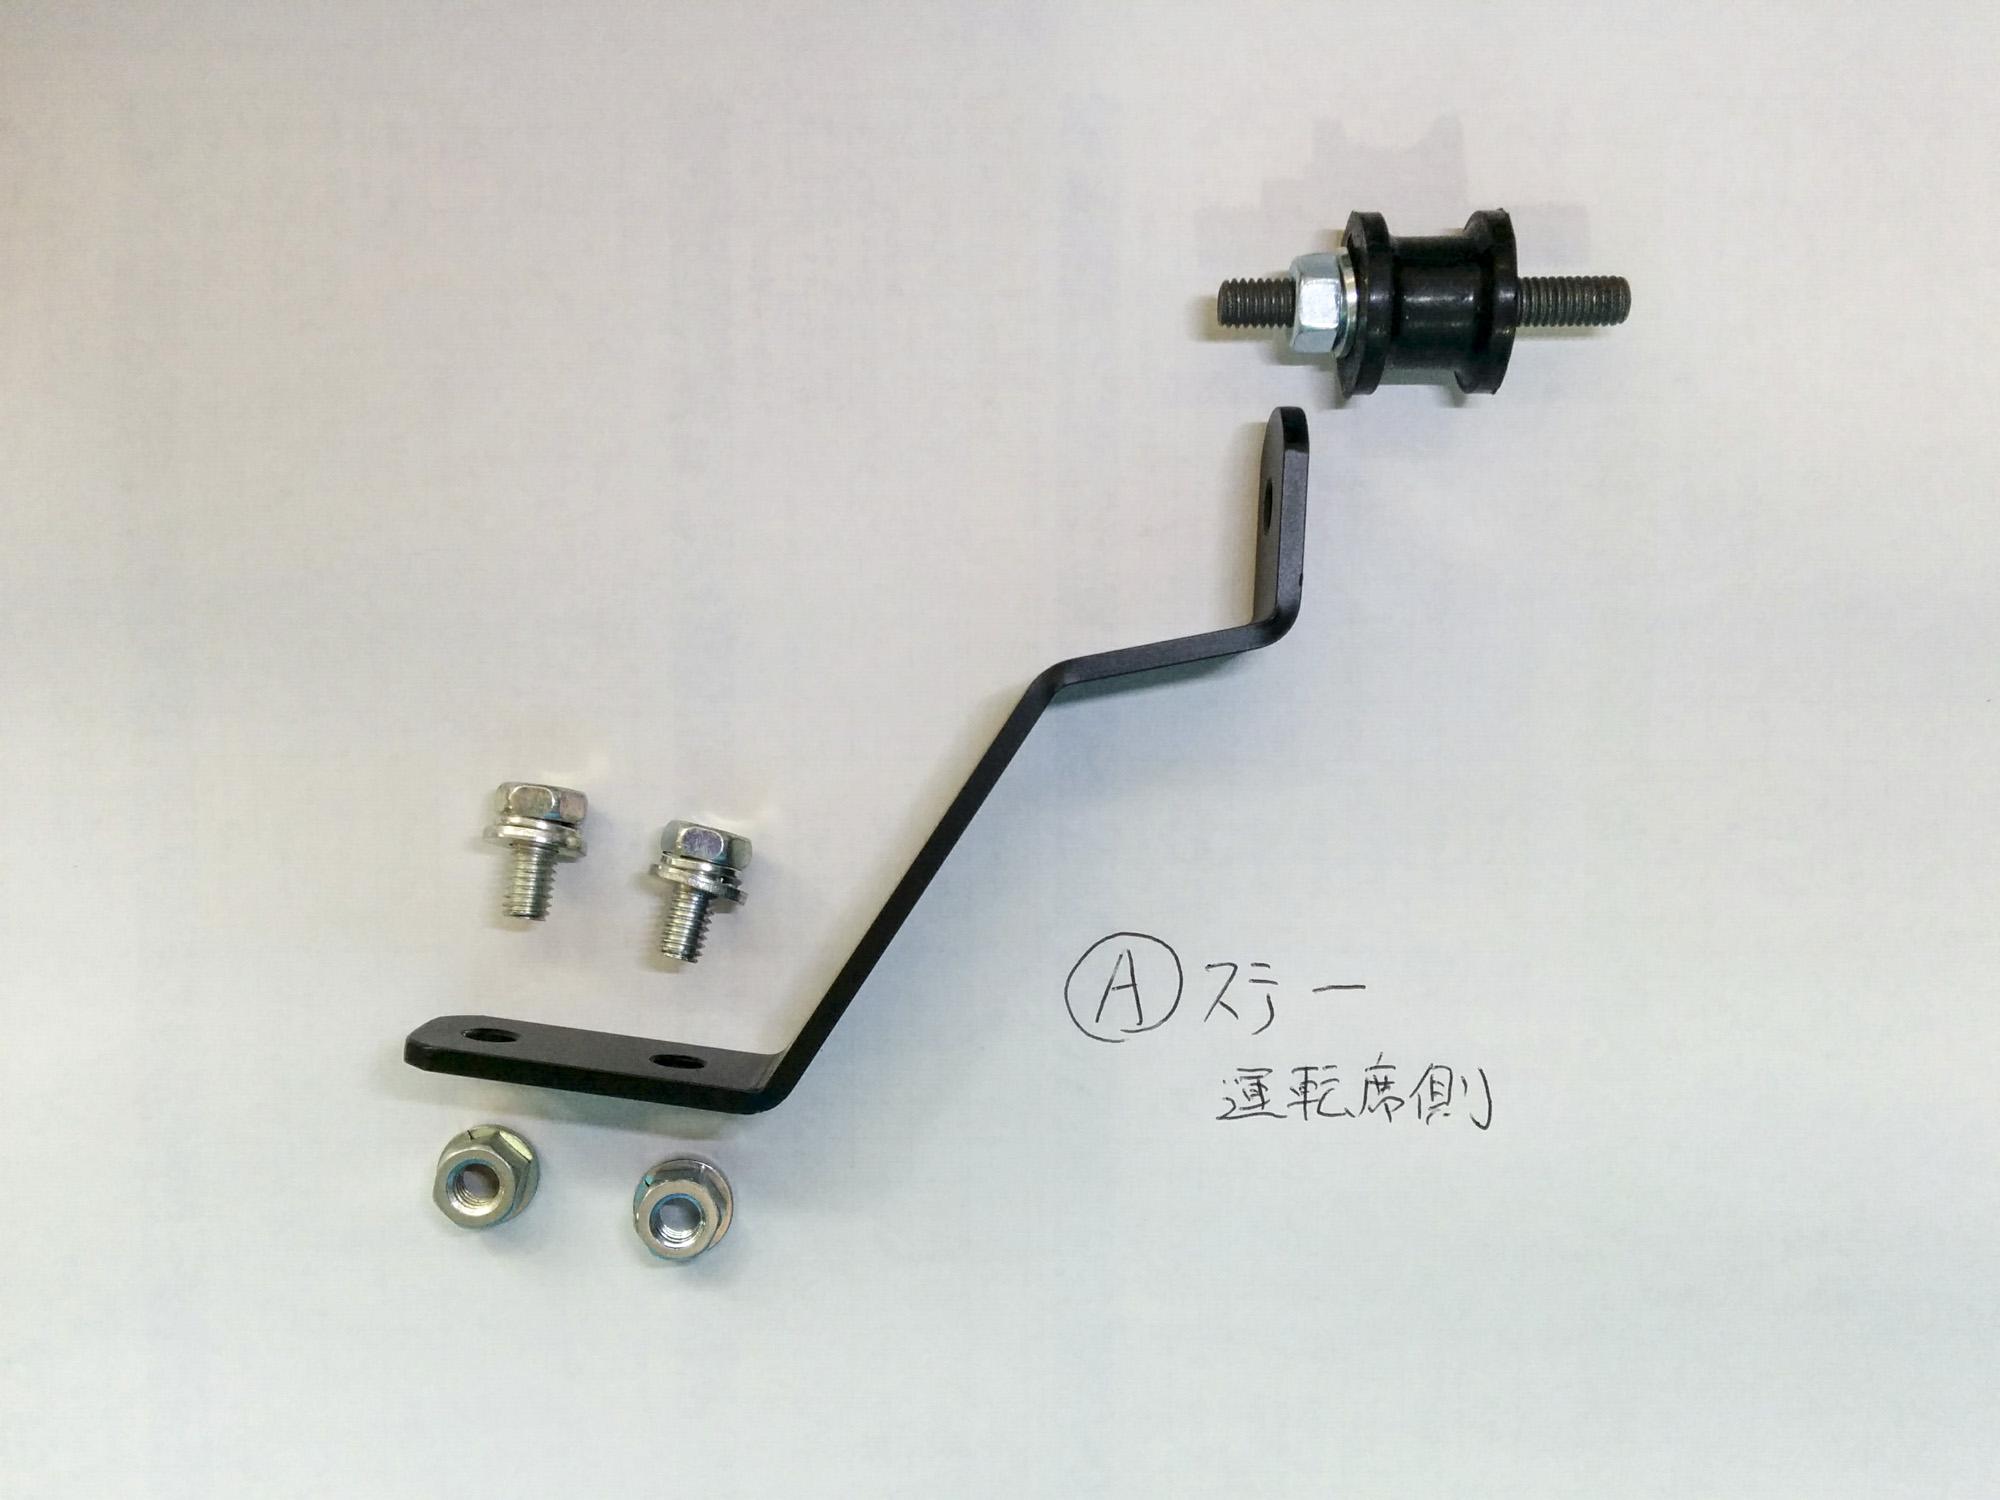 FK2シビックオイルクーラーキット(APJオリジナル)